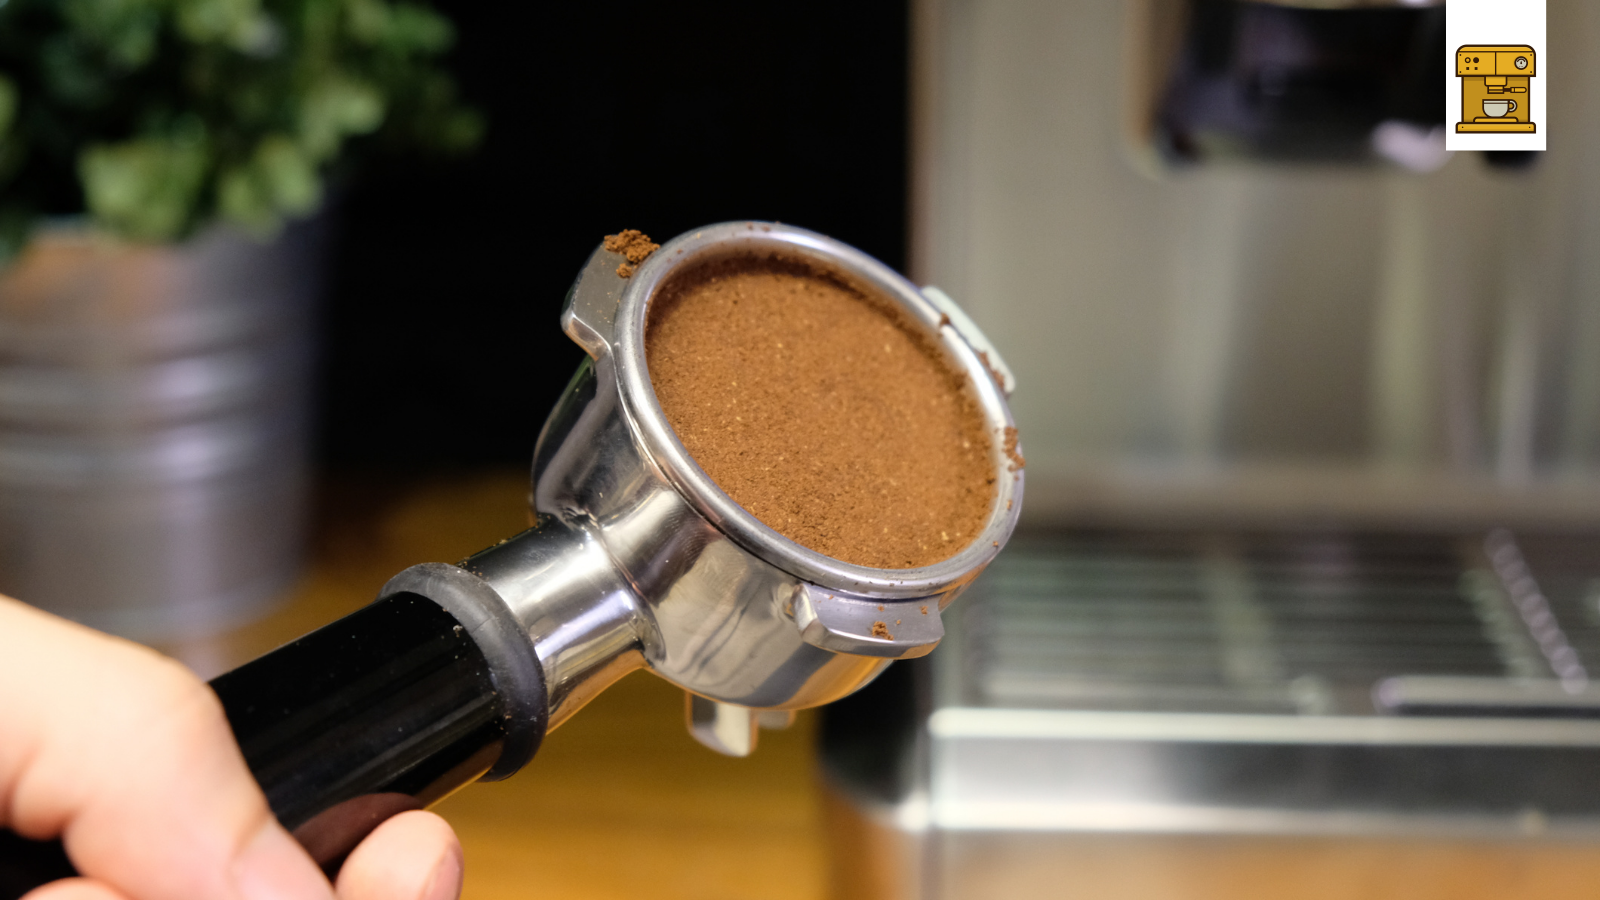 Gestampfter Gemahlener Kaffee